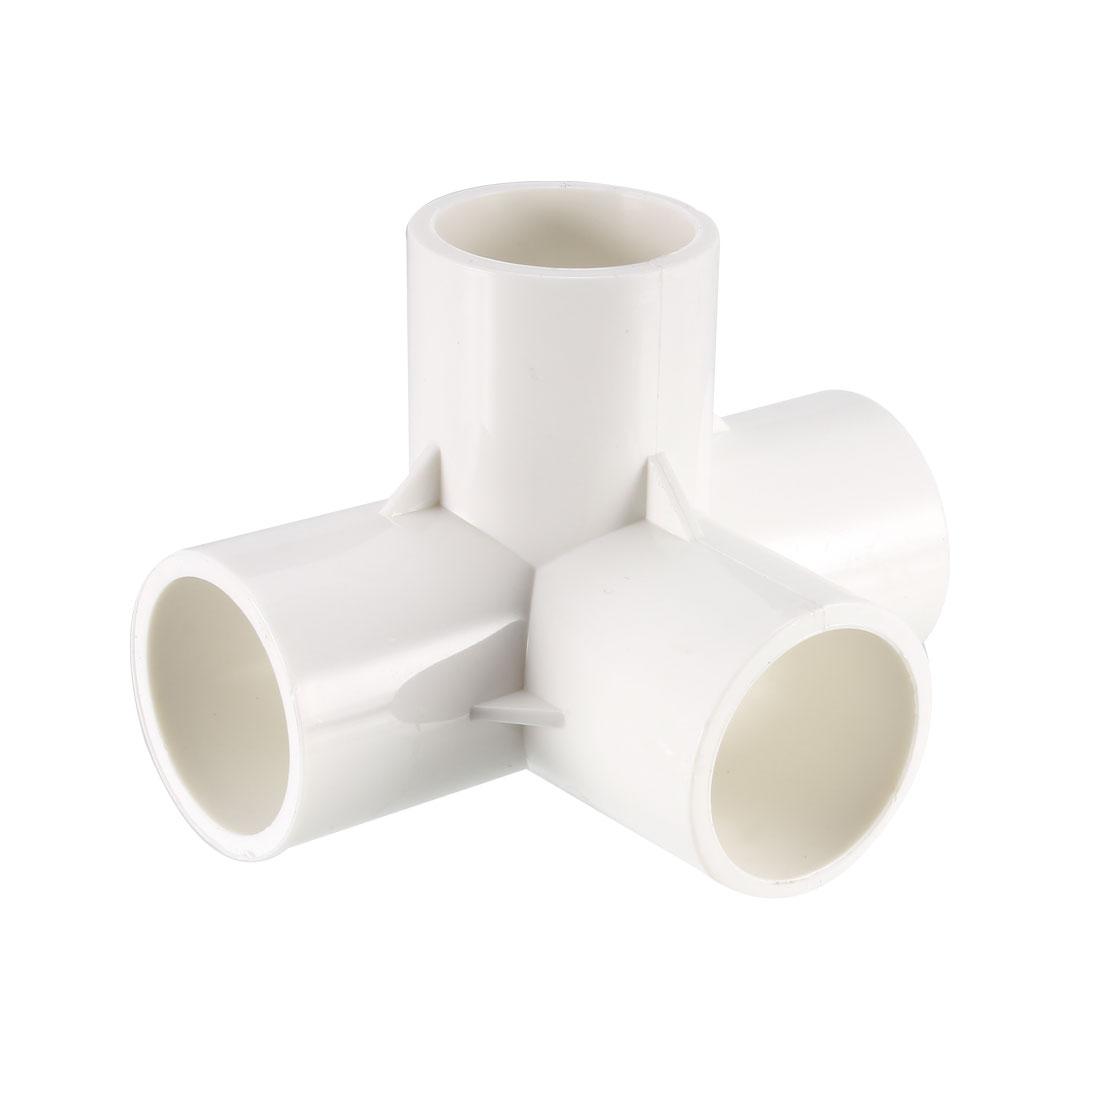 4 Way 25mm Tee PVC Fitting Elbow - PVC Furniture - PVC Elbow Fittings 6Pcs